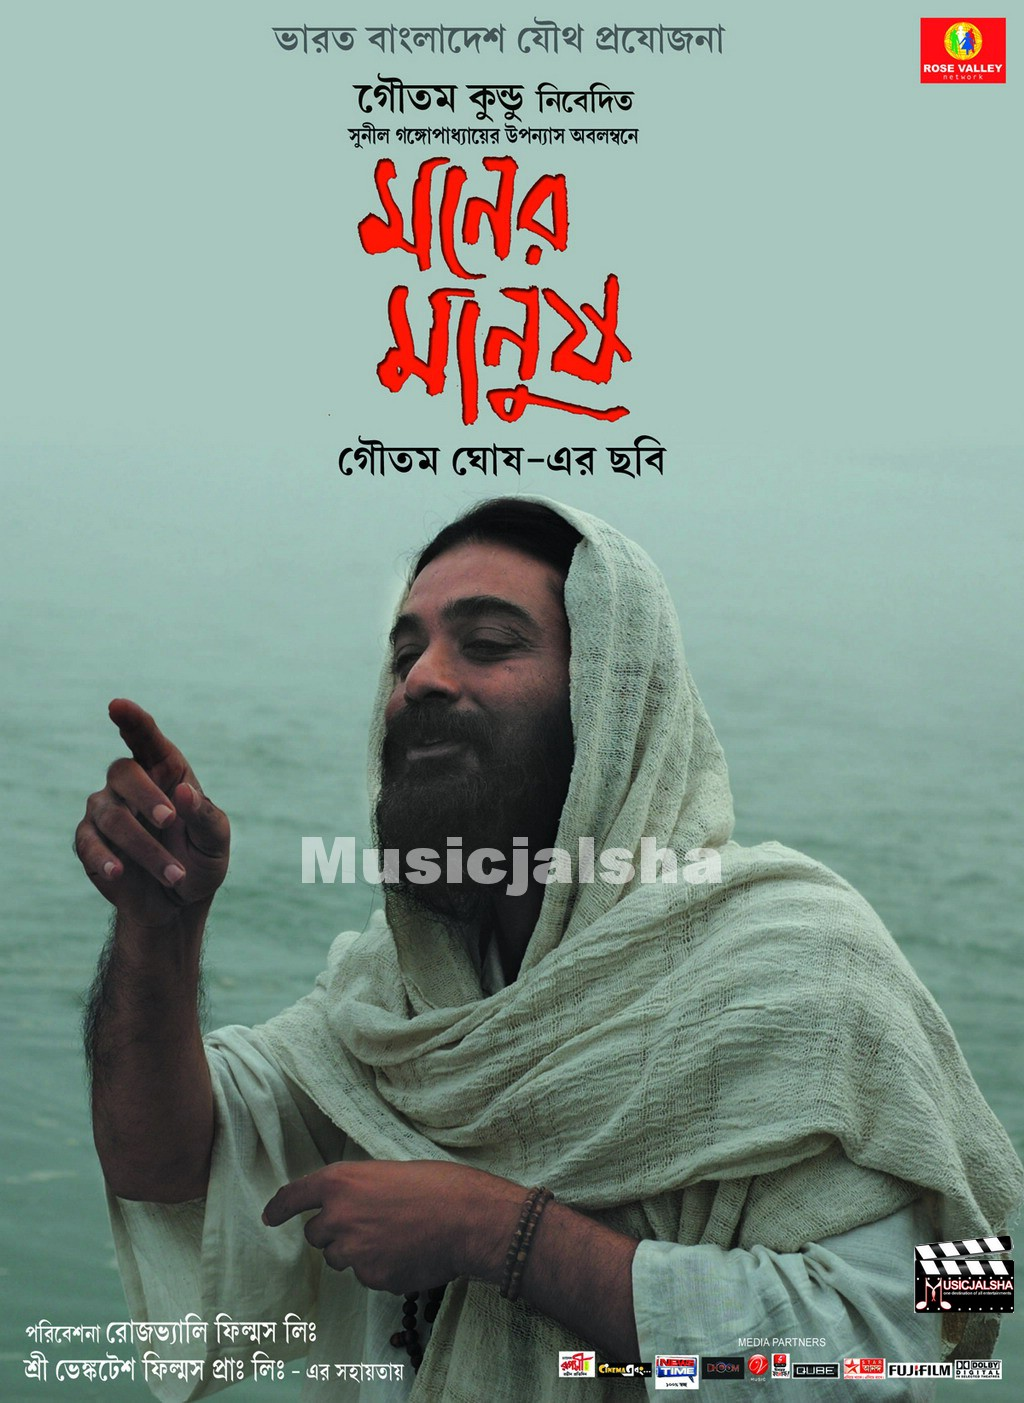 Moner Manush 2010 Kolkata Bangla Movie High Quality Wallpapers Musiqzone